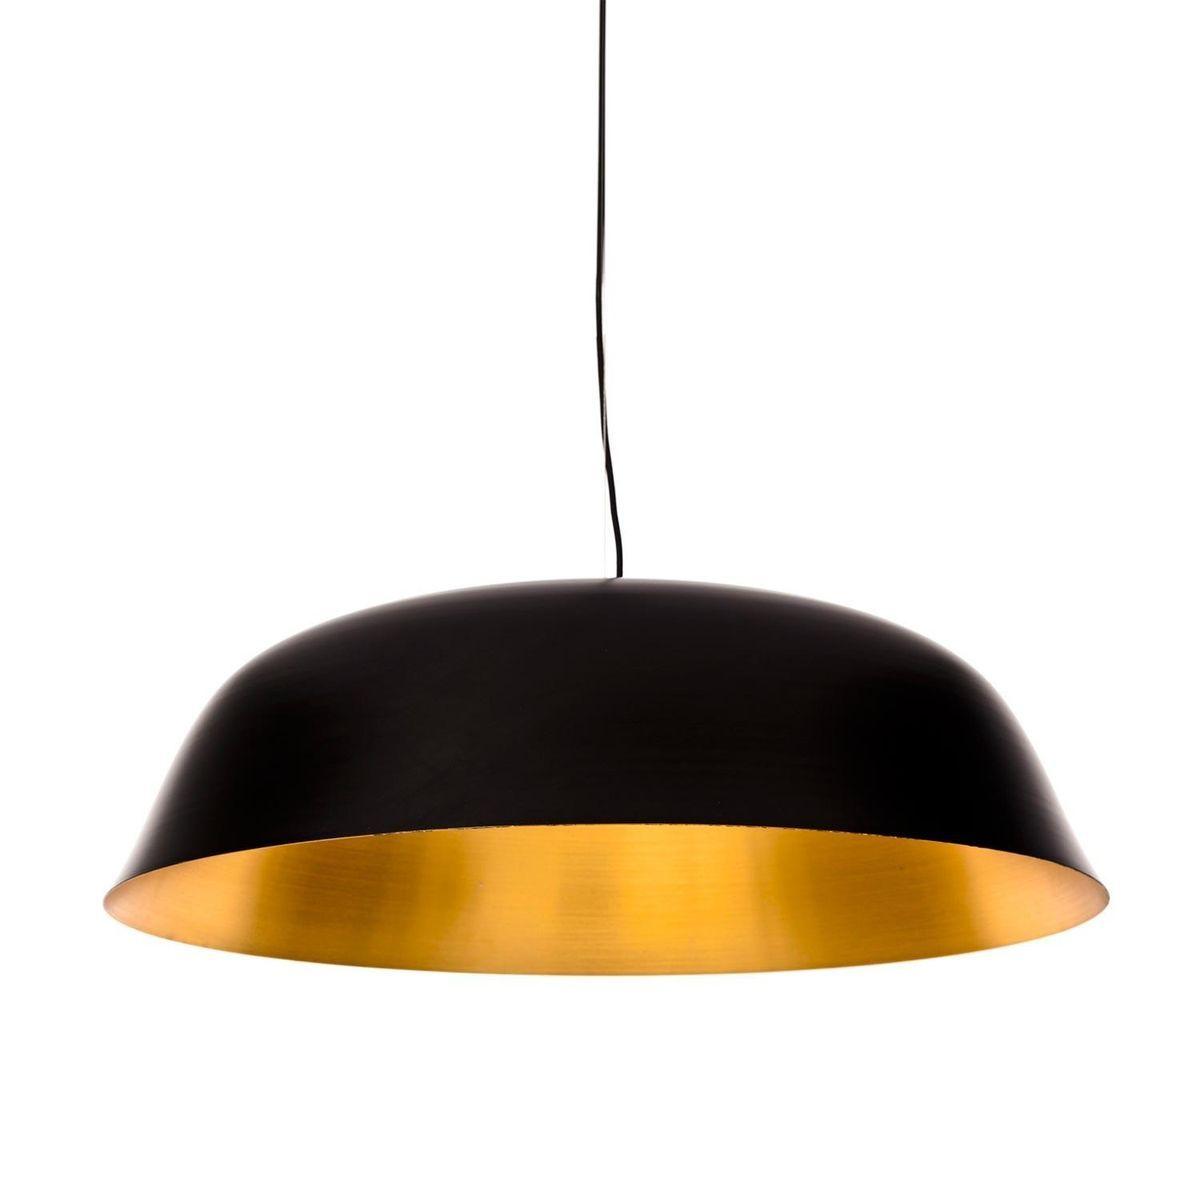 NORR 11 Cloche Three Suspension Lamp black brushed copper inside